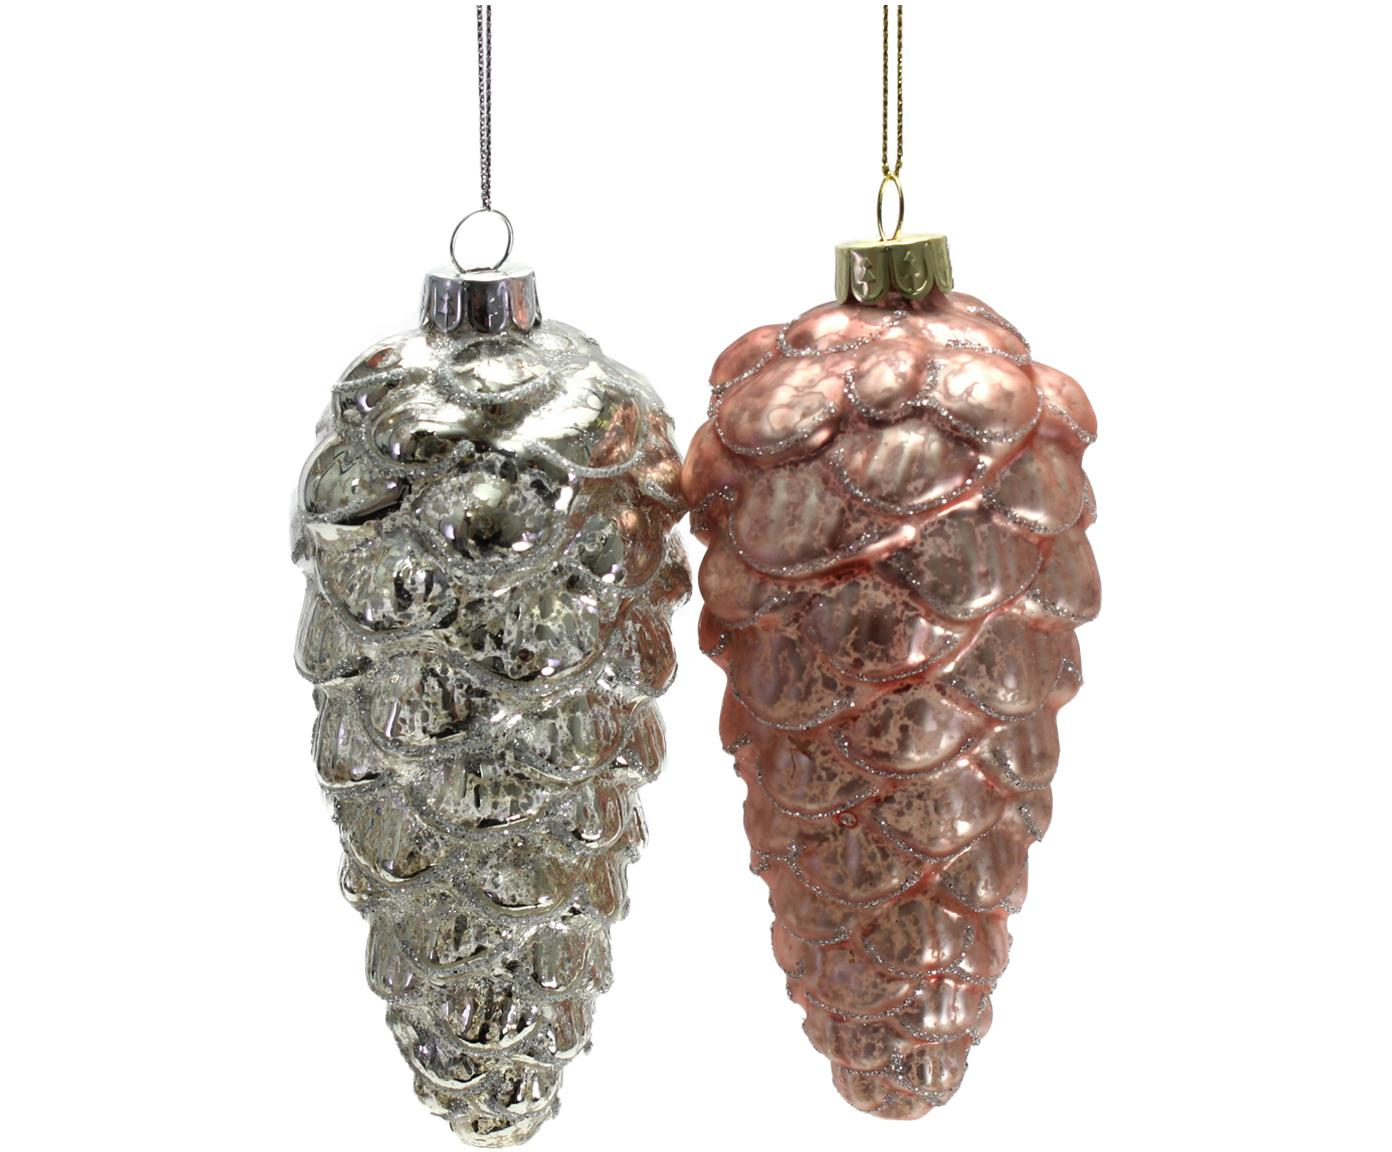 Decoratieve hangersset Colorful Christmas, 4-delig, Gelakt glas, Roze, zilverkleurig, Ø 7 x H 14 cm